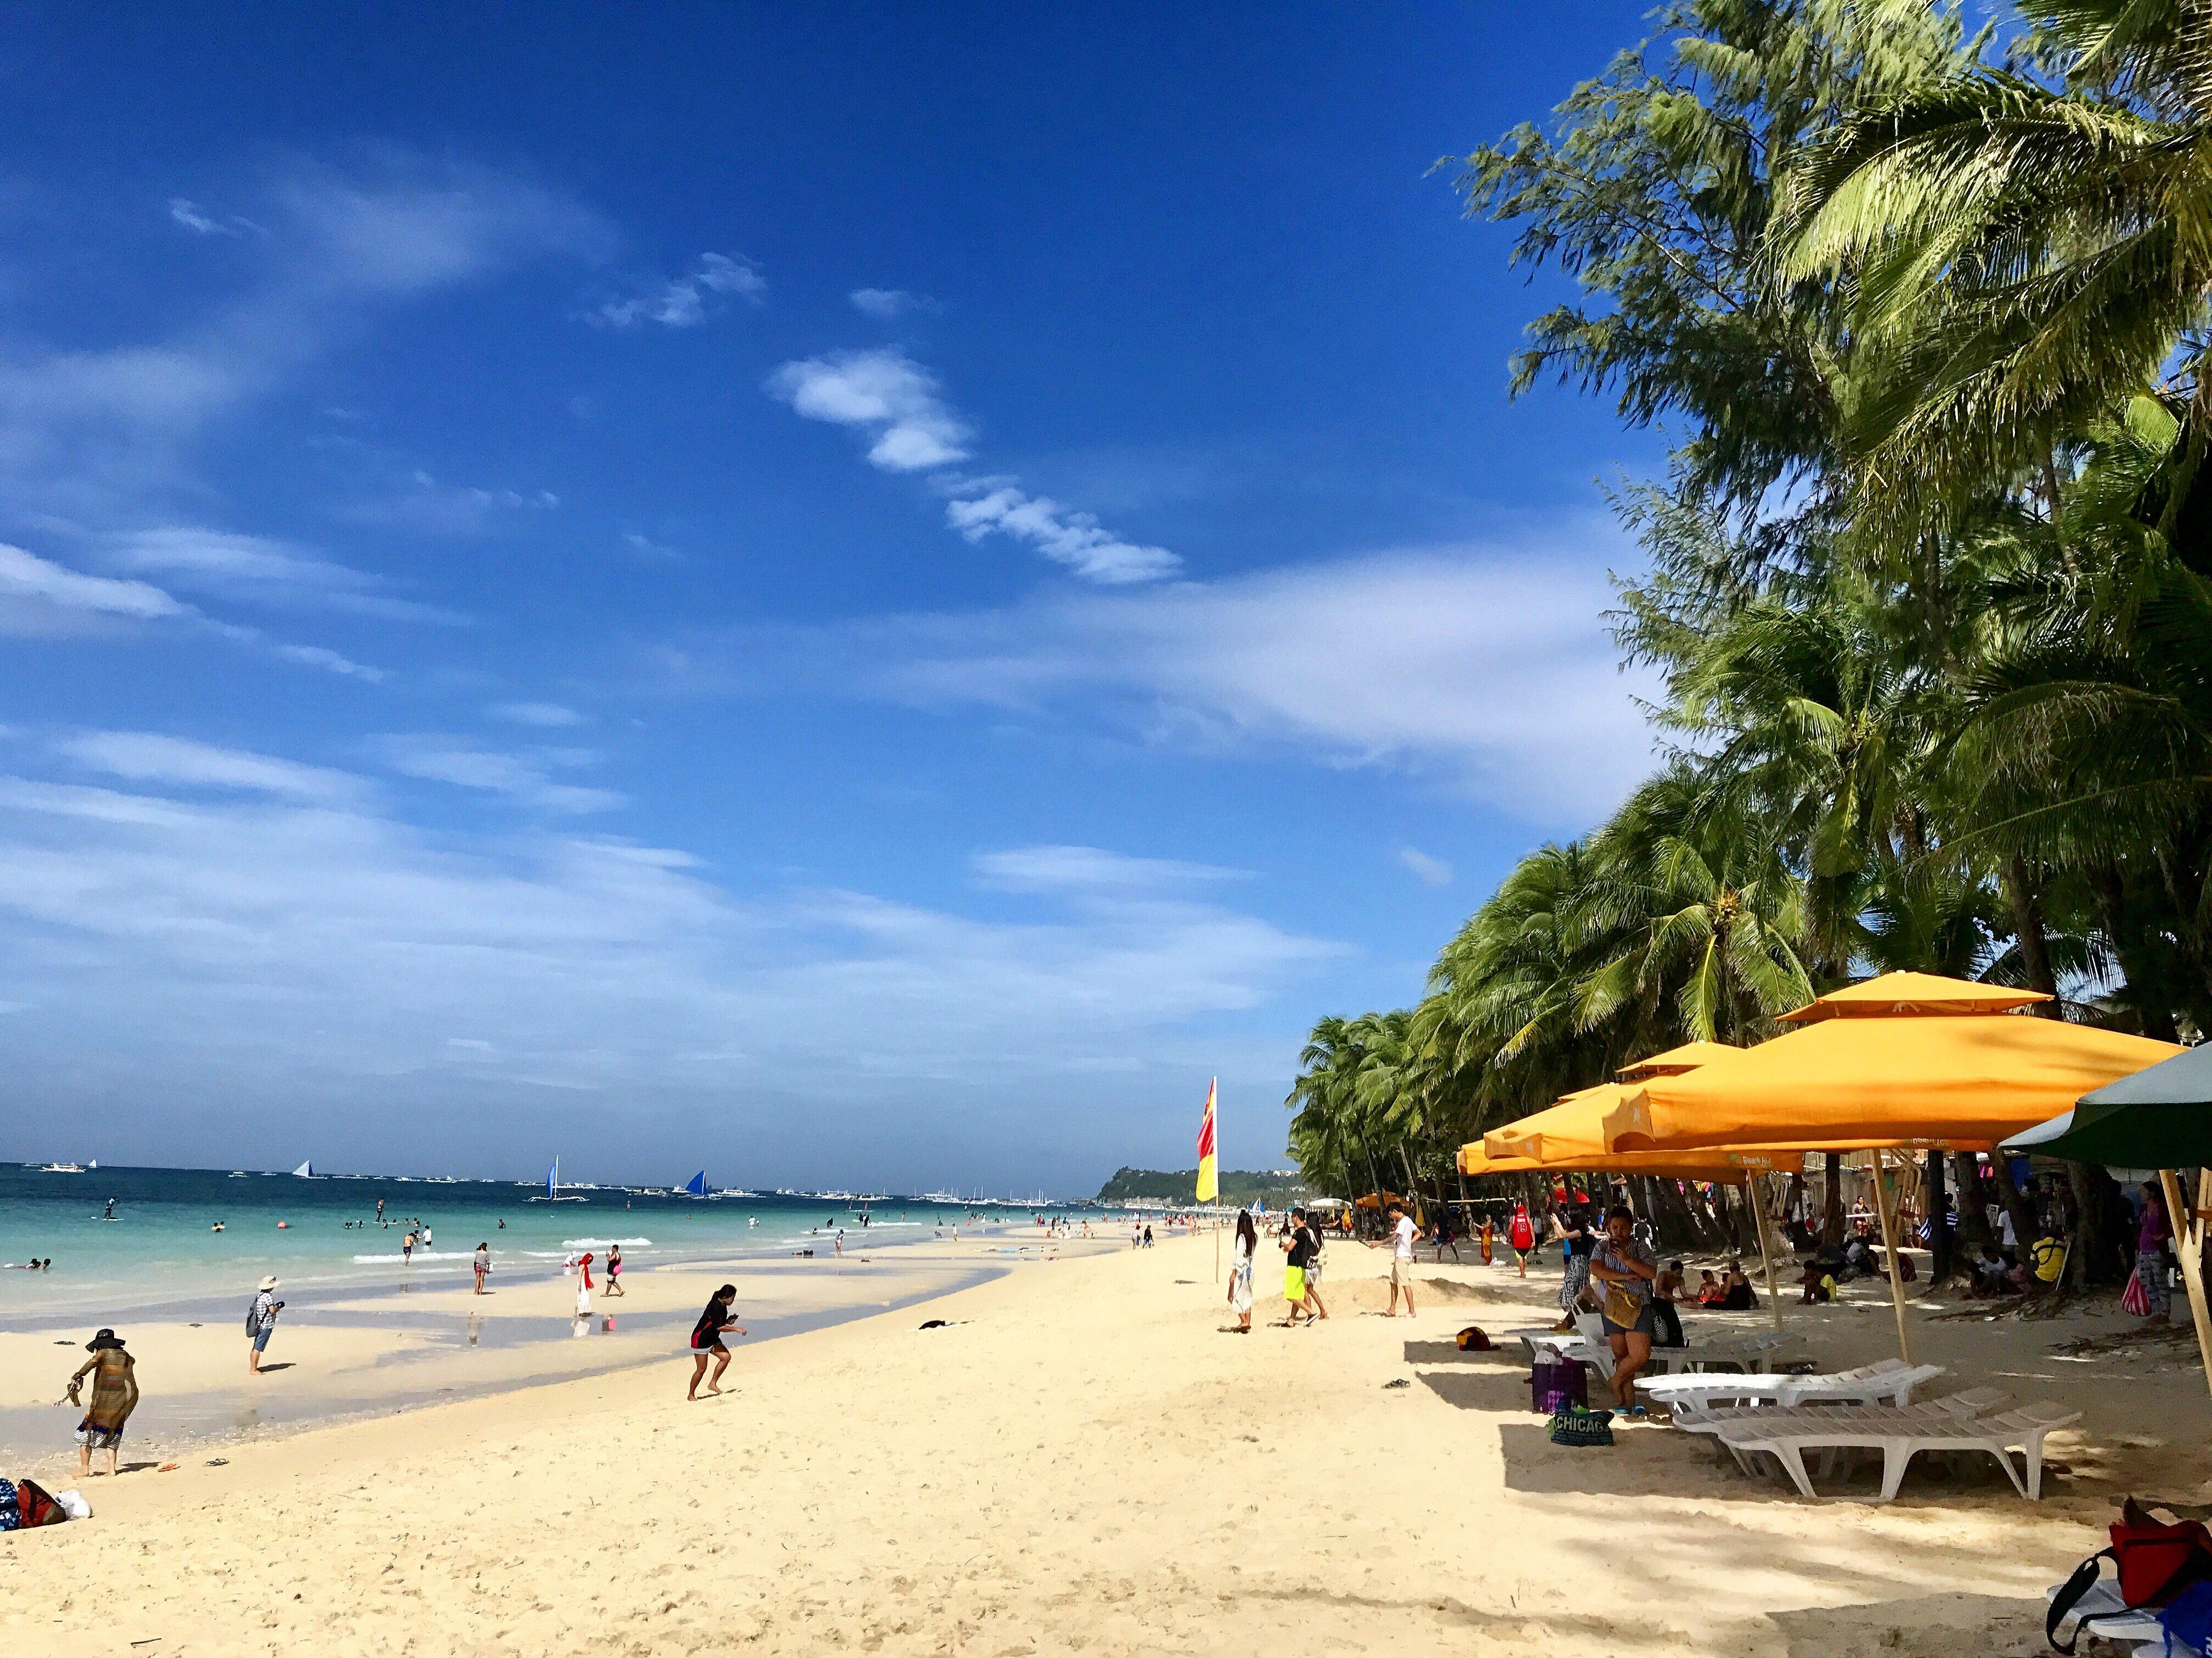 Pin by Zaldy Barlis on Beach | Philippines travel